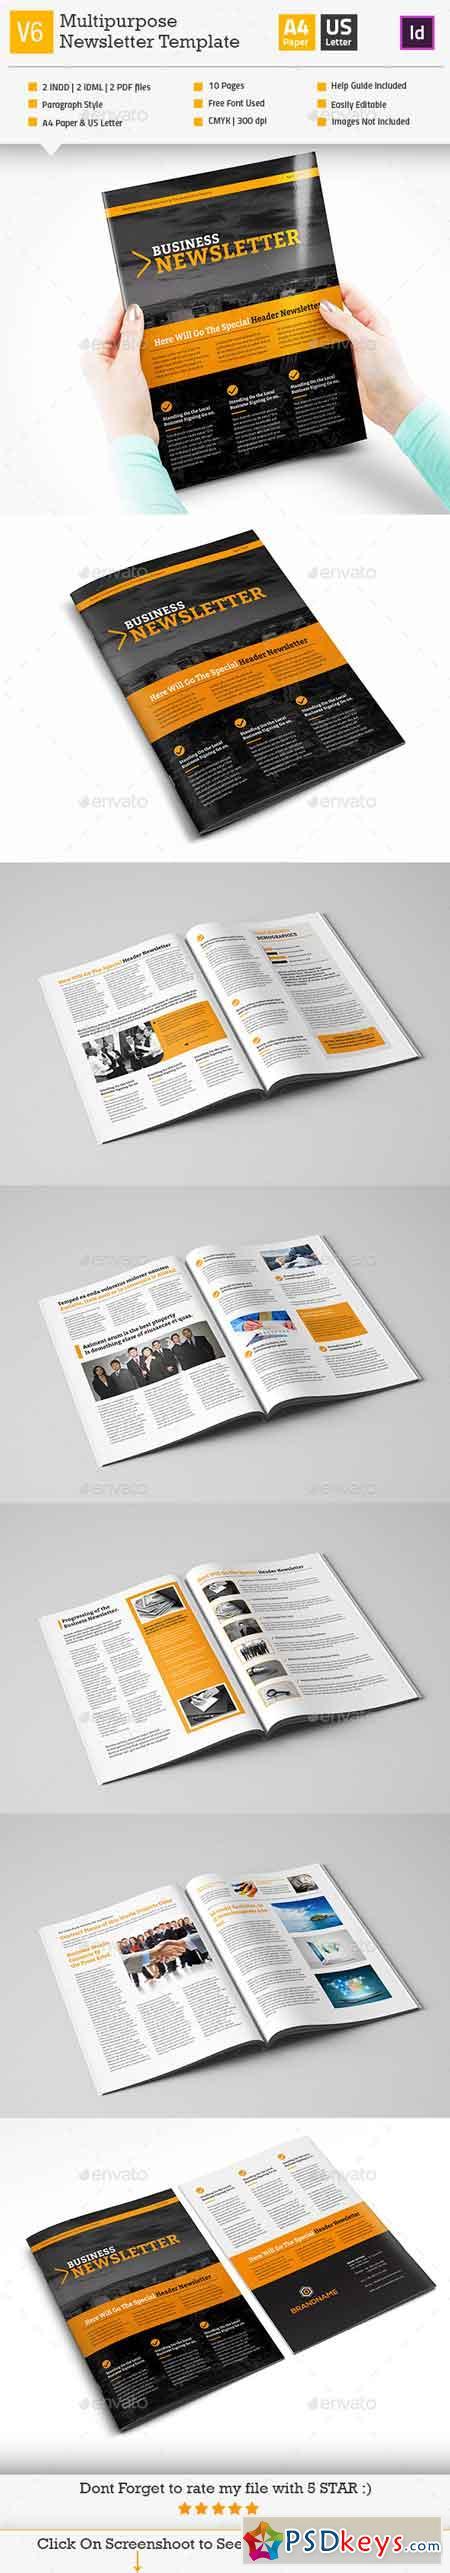 Multipurpose Newsletter Template_InDesign_V6 12103370